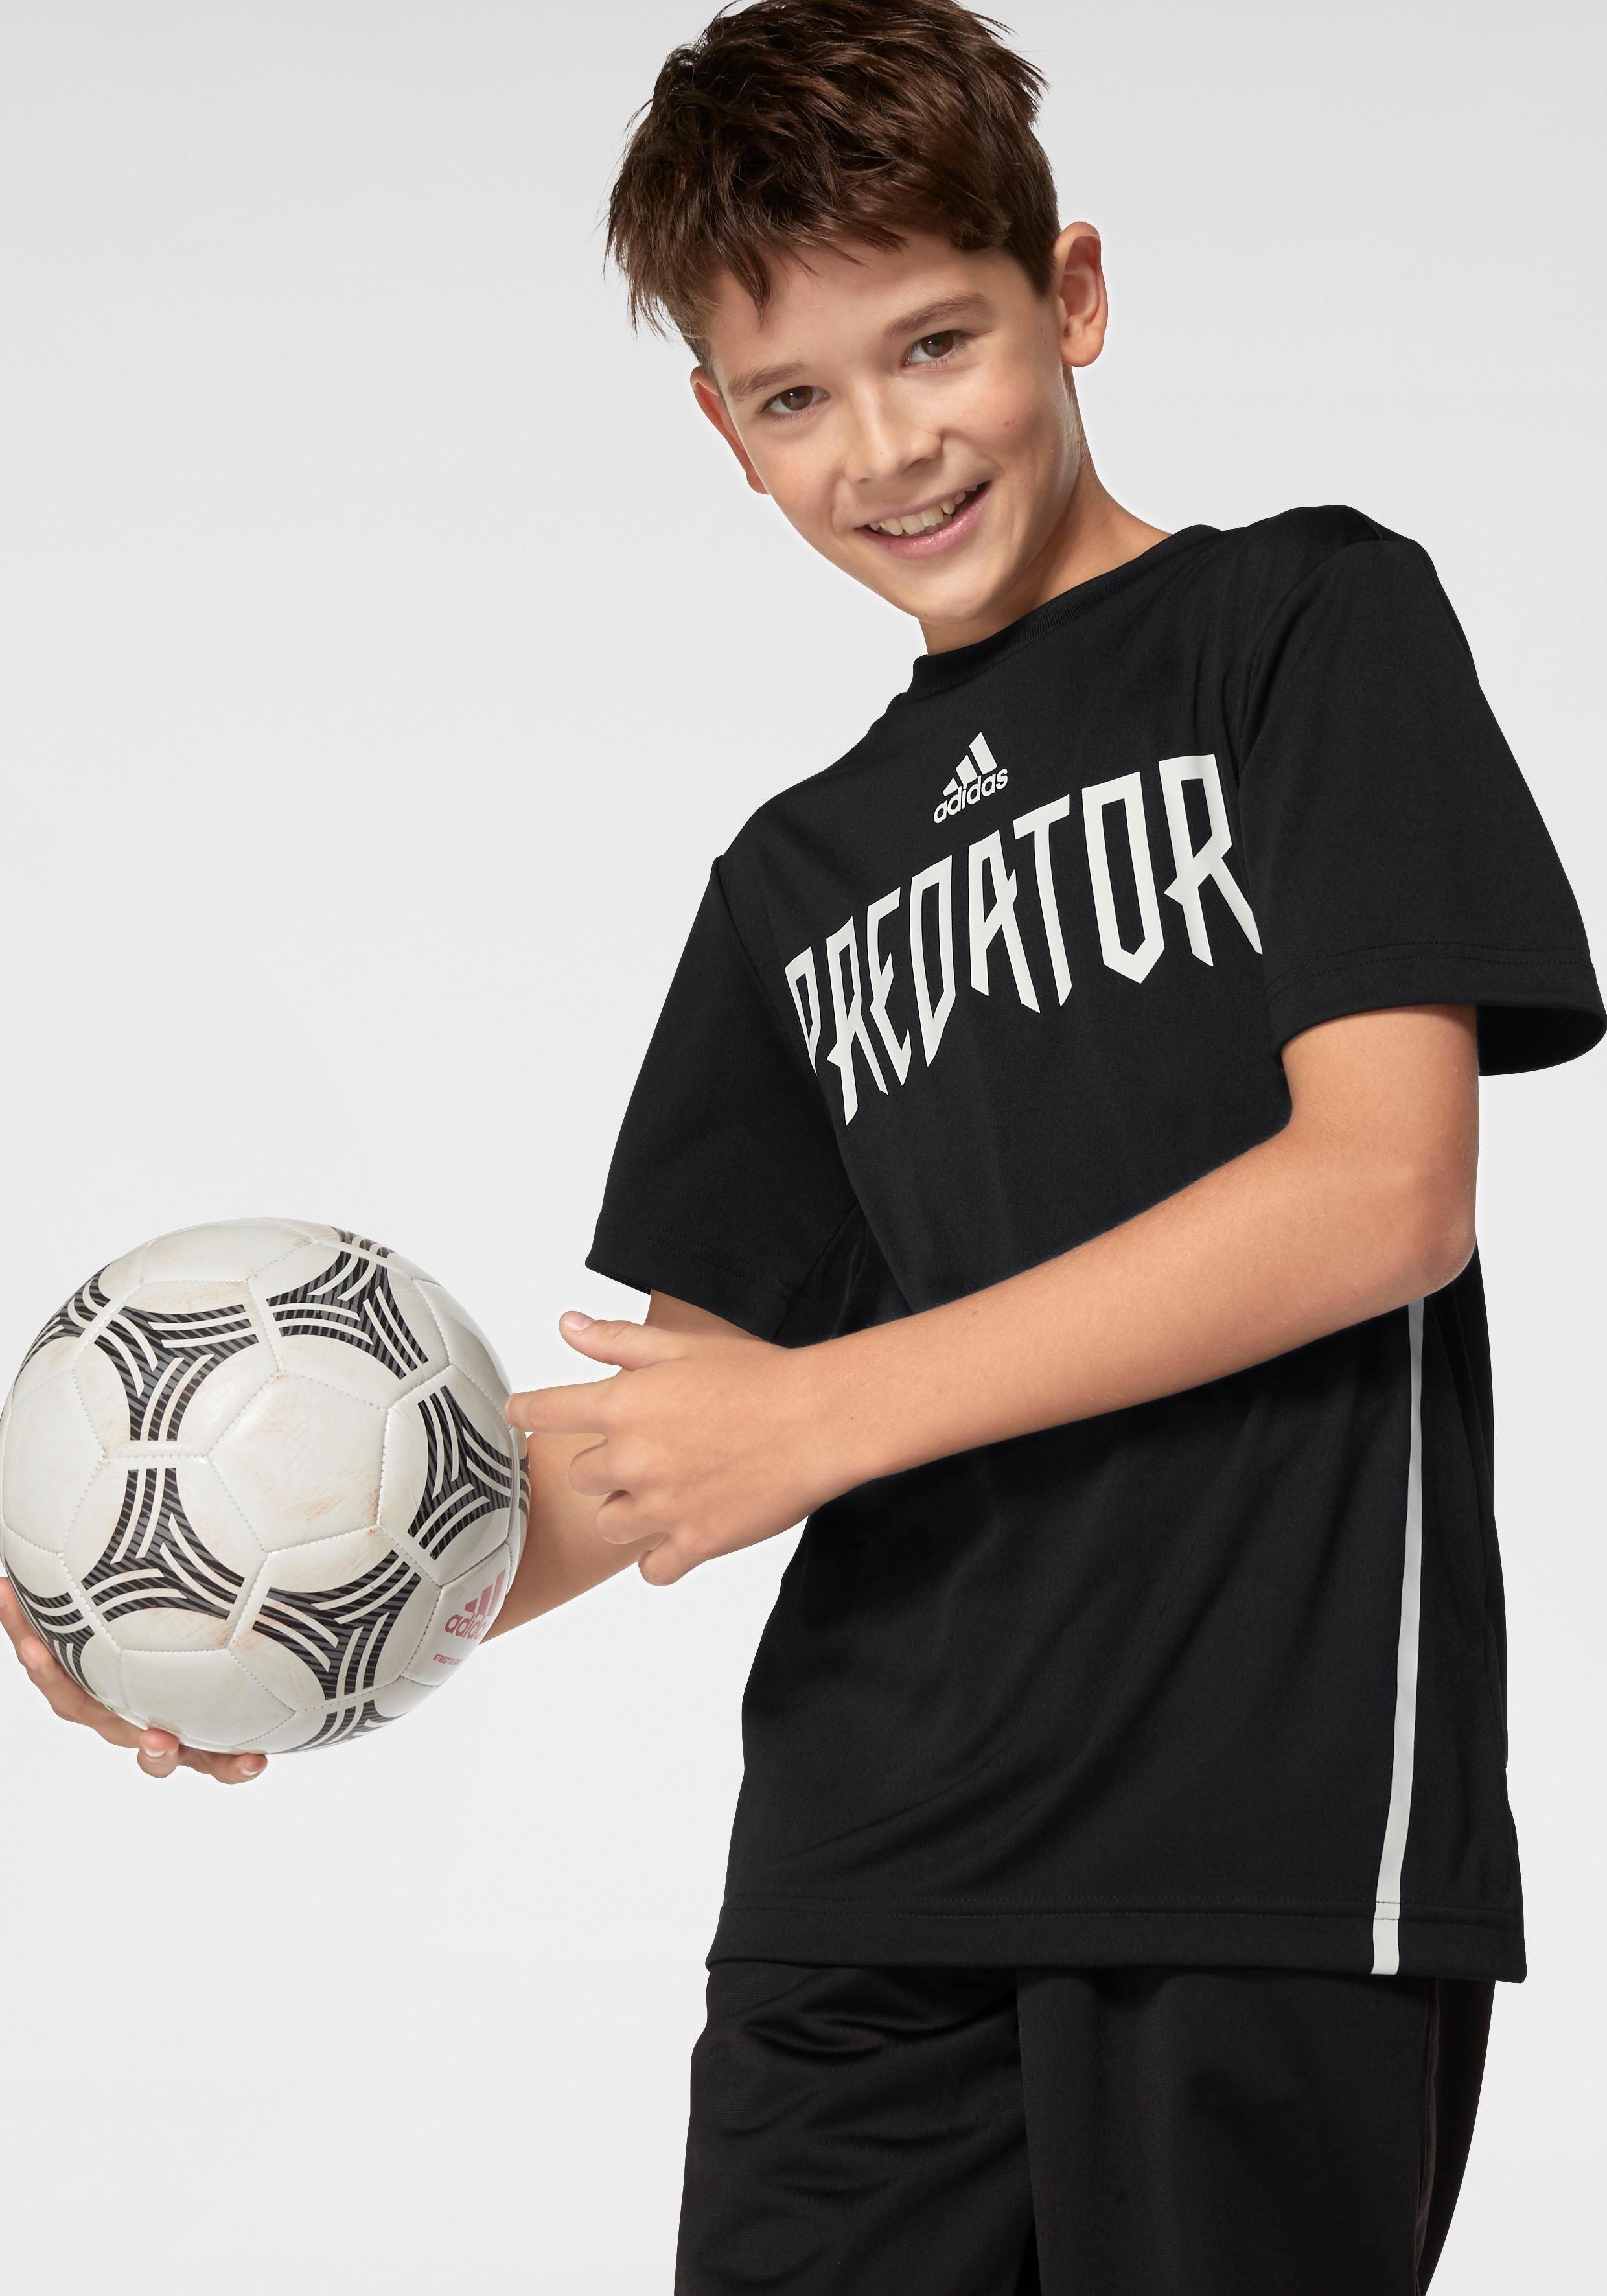 adidas Performance trainingsshirt »YOUNG BOYS PREDATOR JERSEY« bestellen: 14 dagen bedenktijd